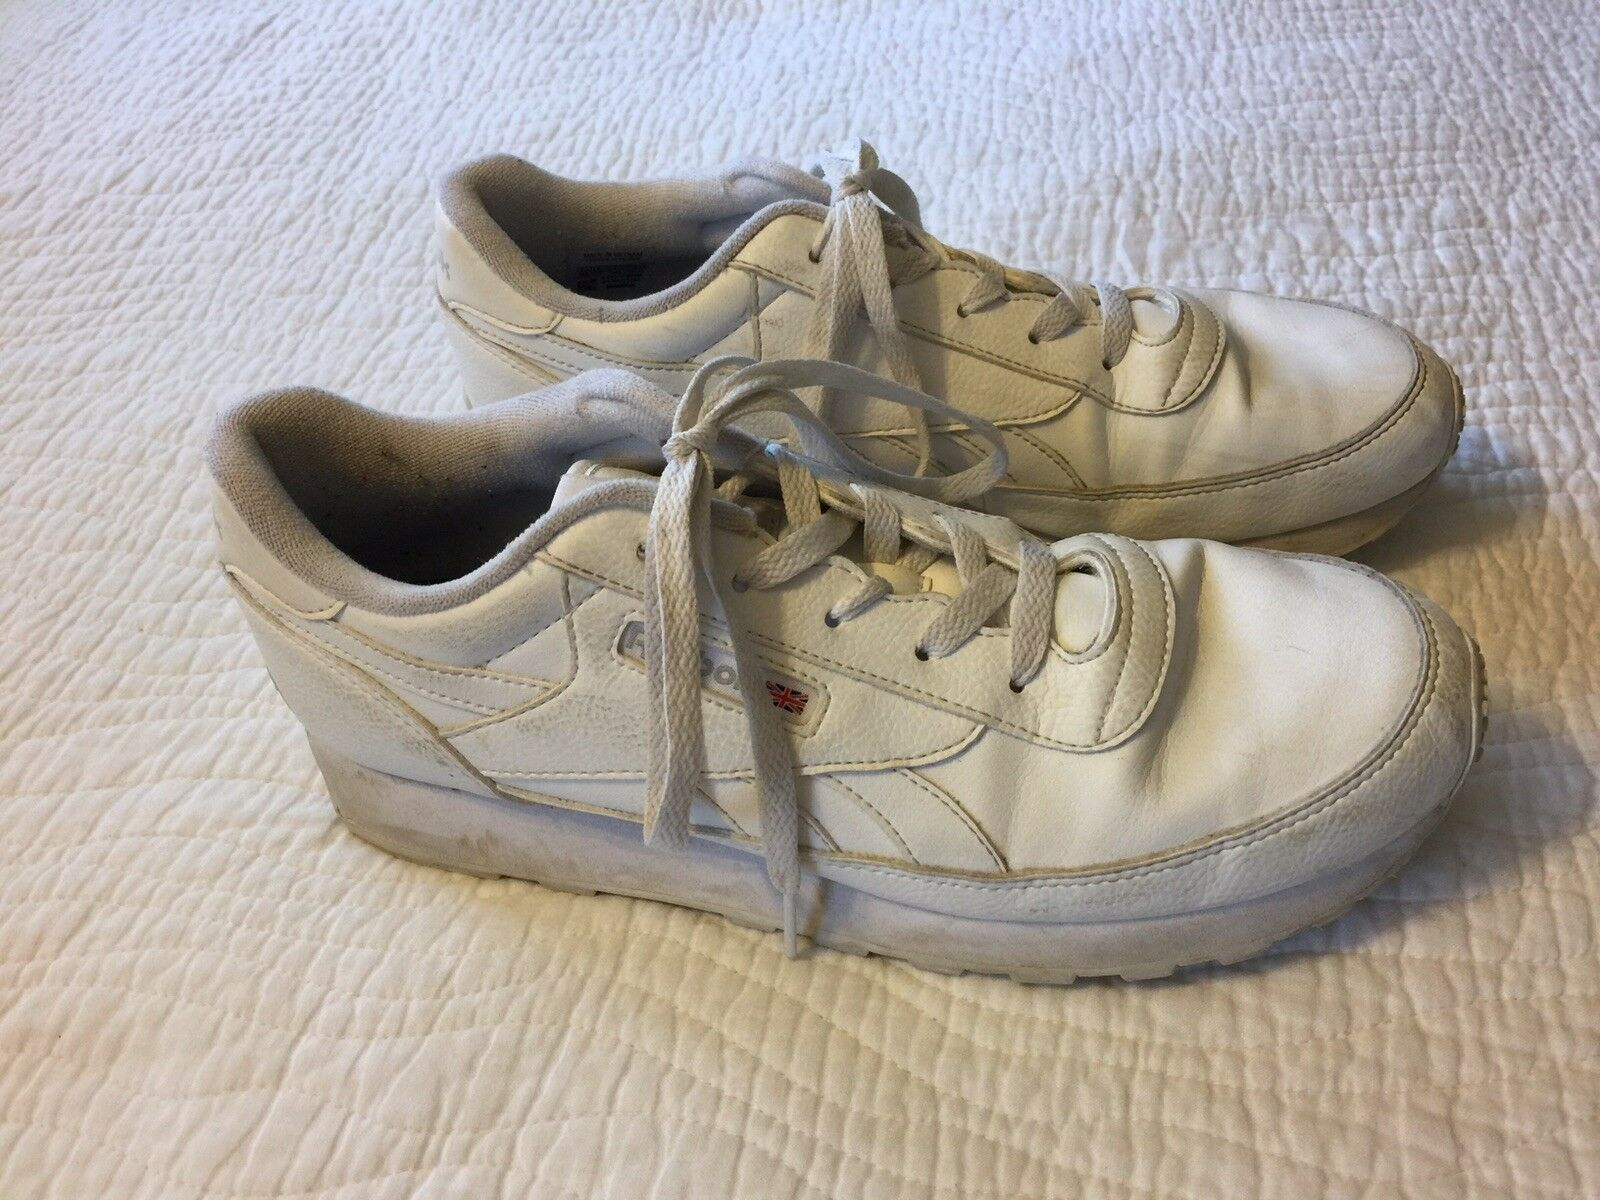 Reebok classic leather white Sneakers Women's 10